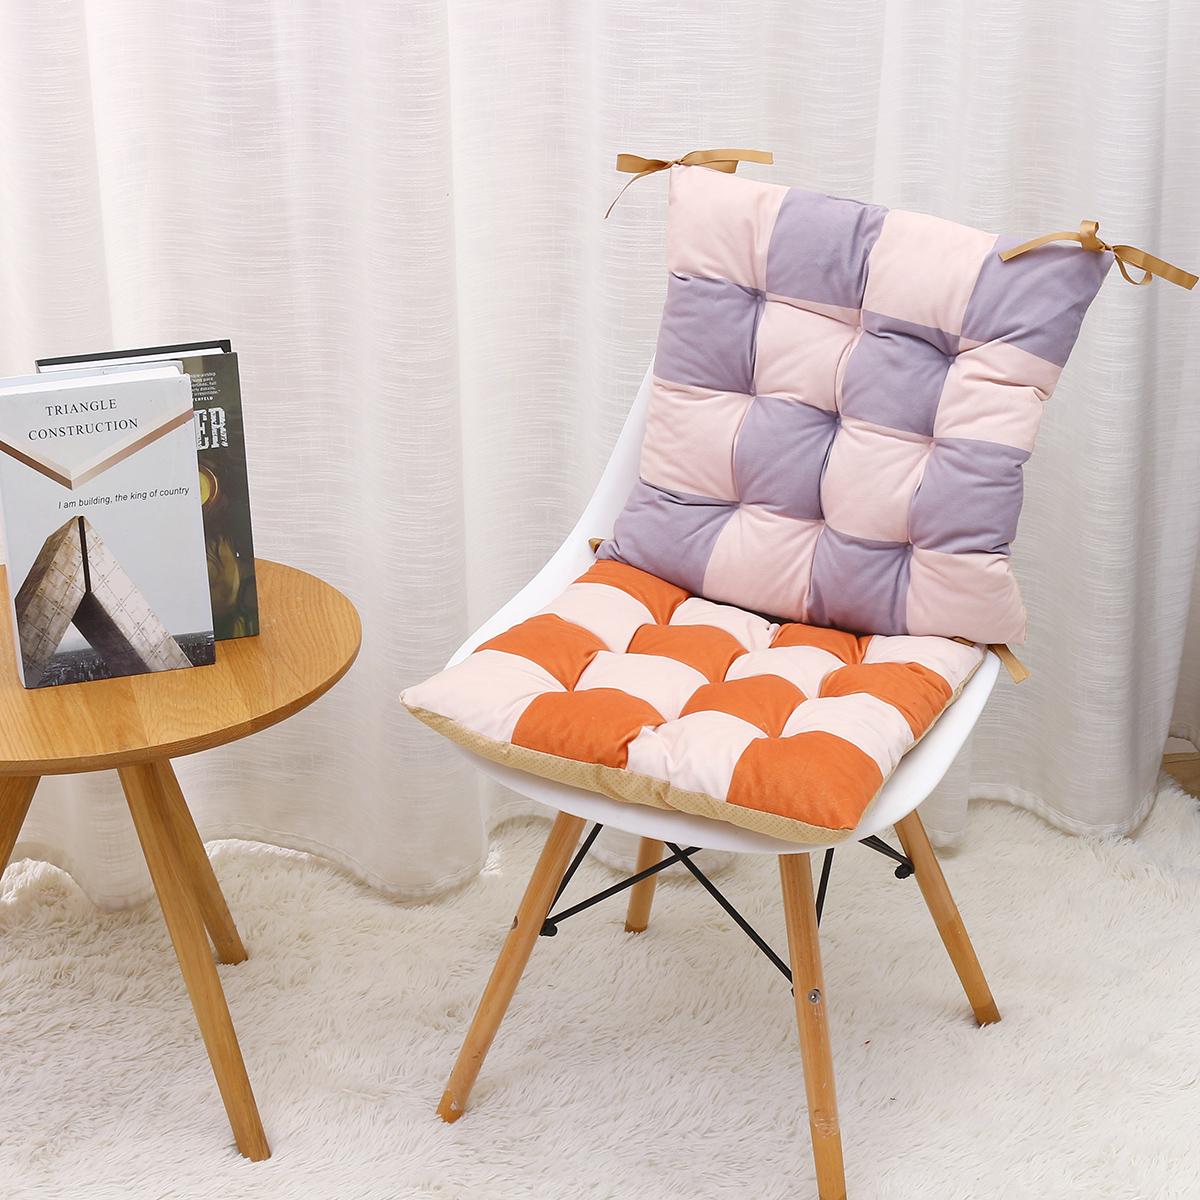 6 Colors Non-slip Square Seat Cushion Suitable Home Office Restaurant Bar